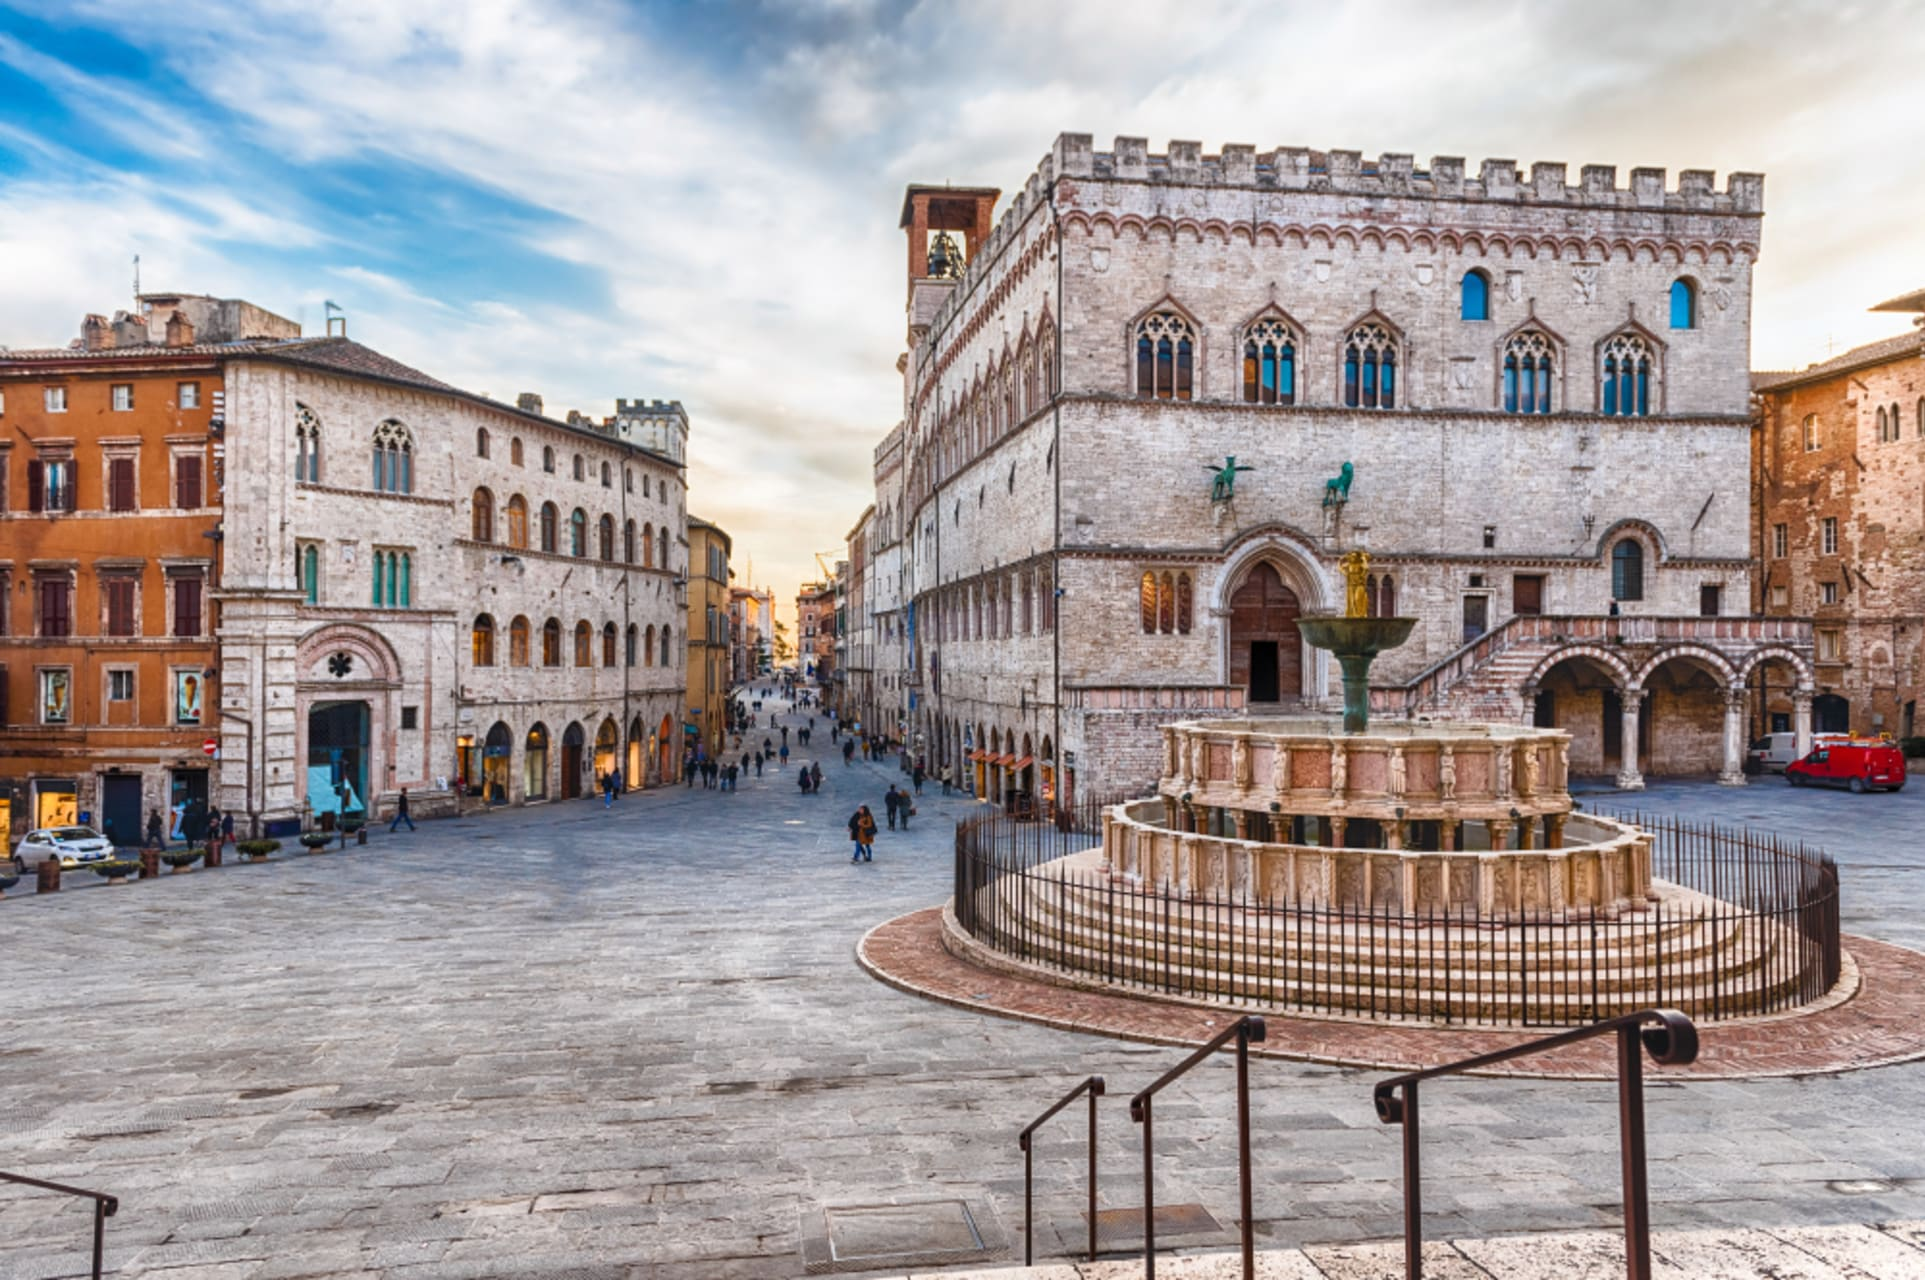 Perugia - Ontdek Perugia in het Nederlands (PRACTICE DUTCH/FLEMISH)